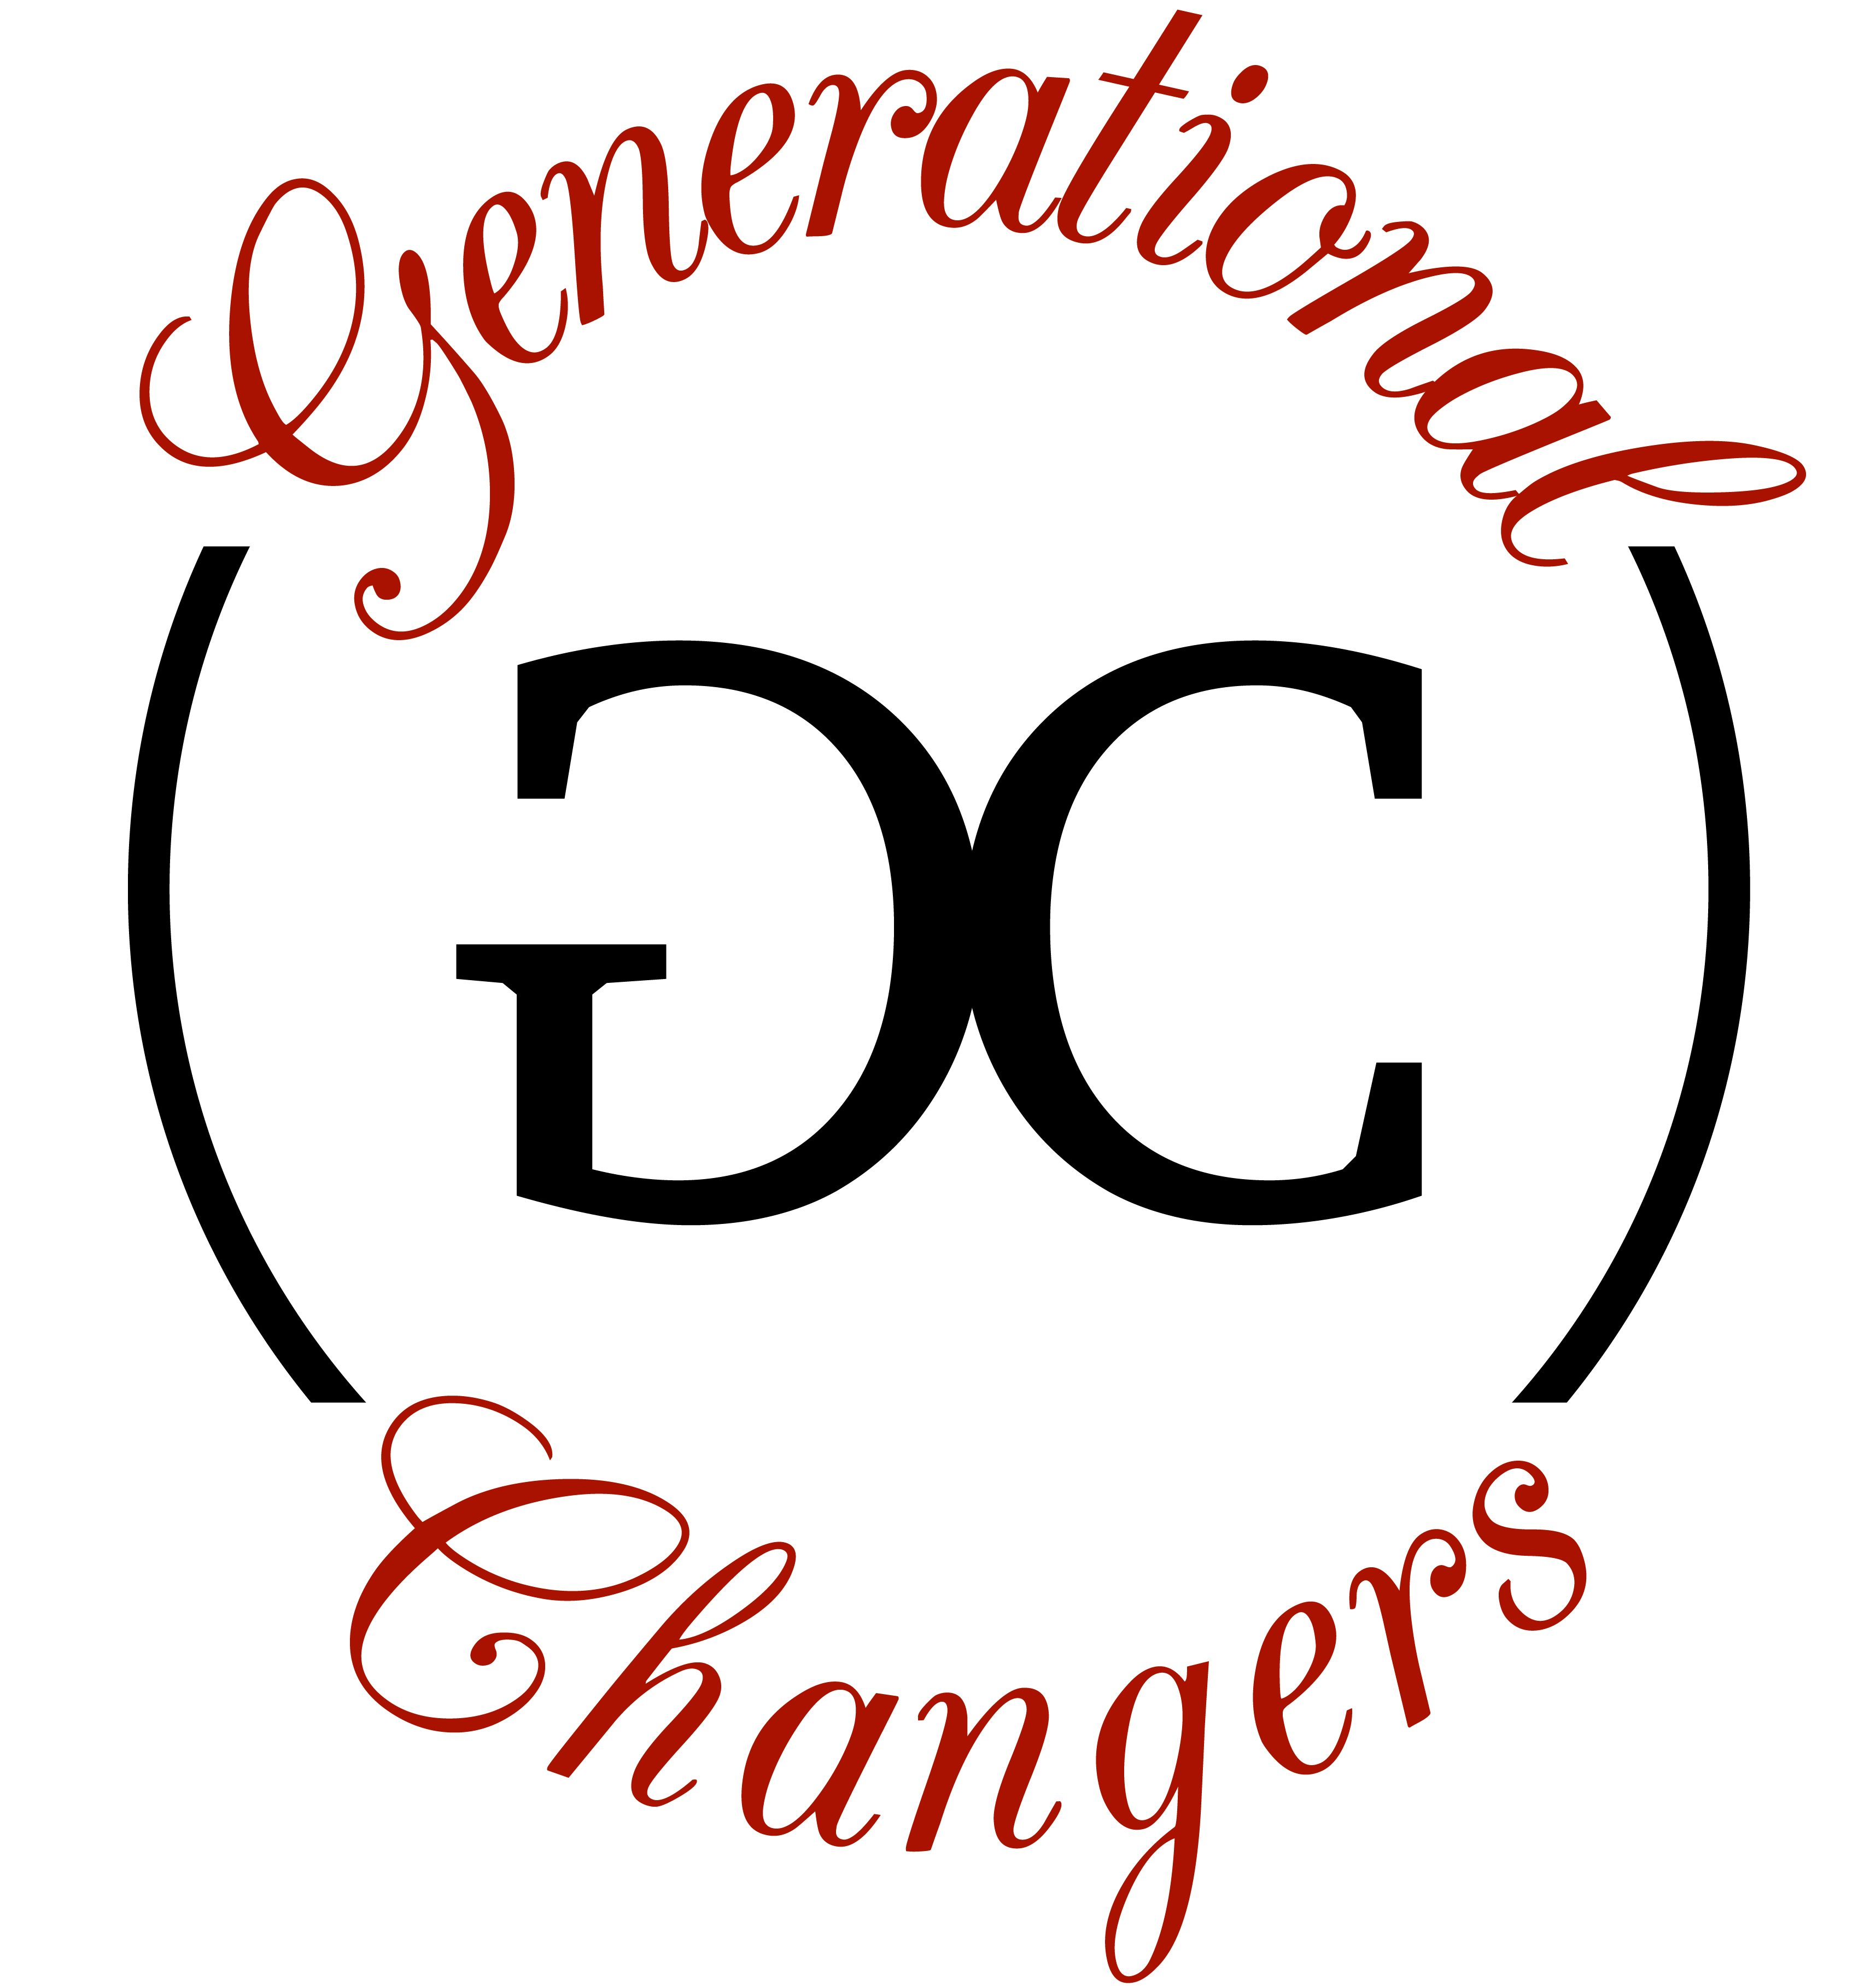 Generational Changers